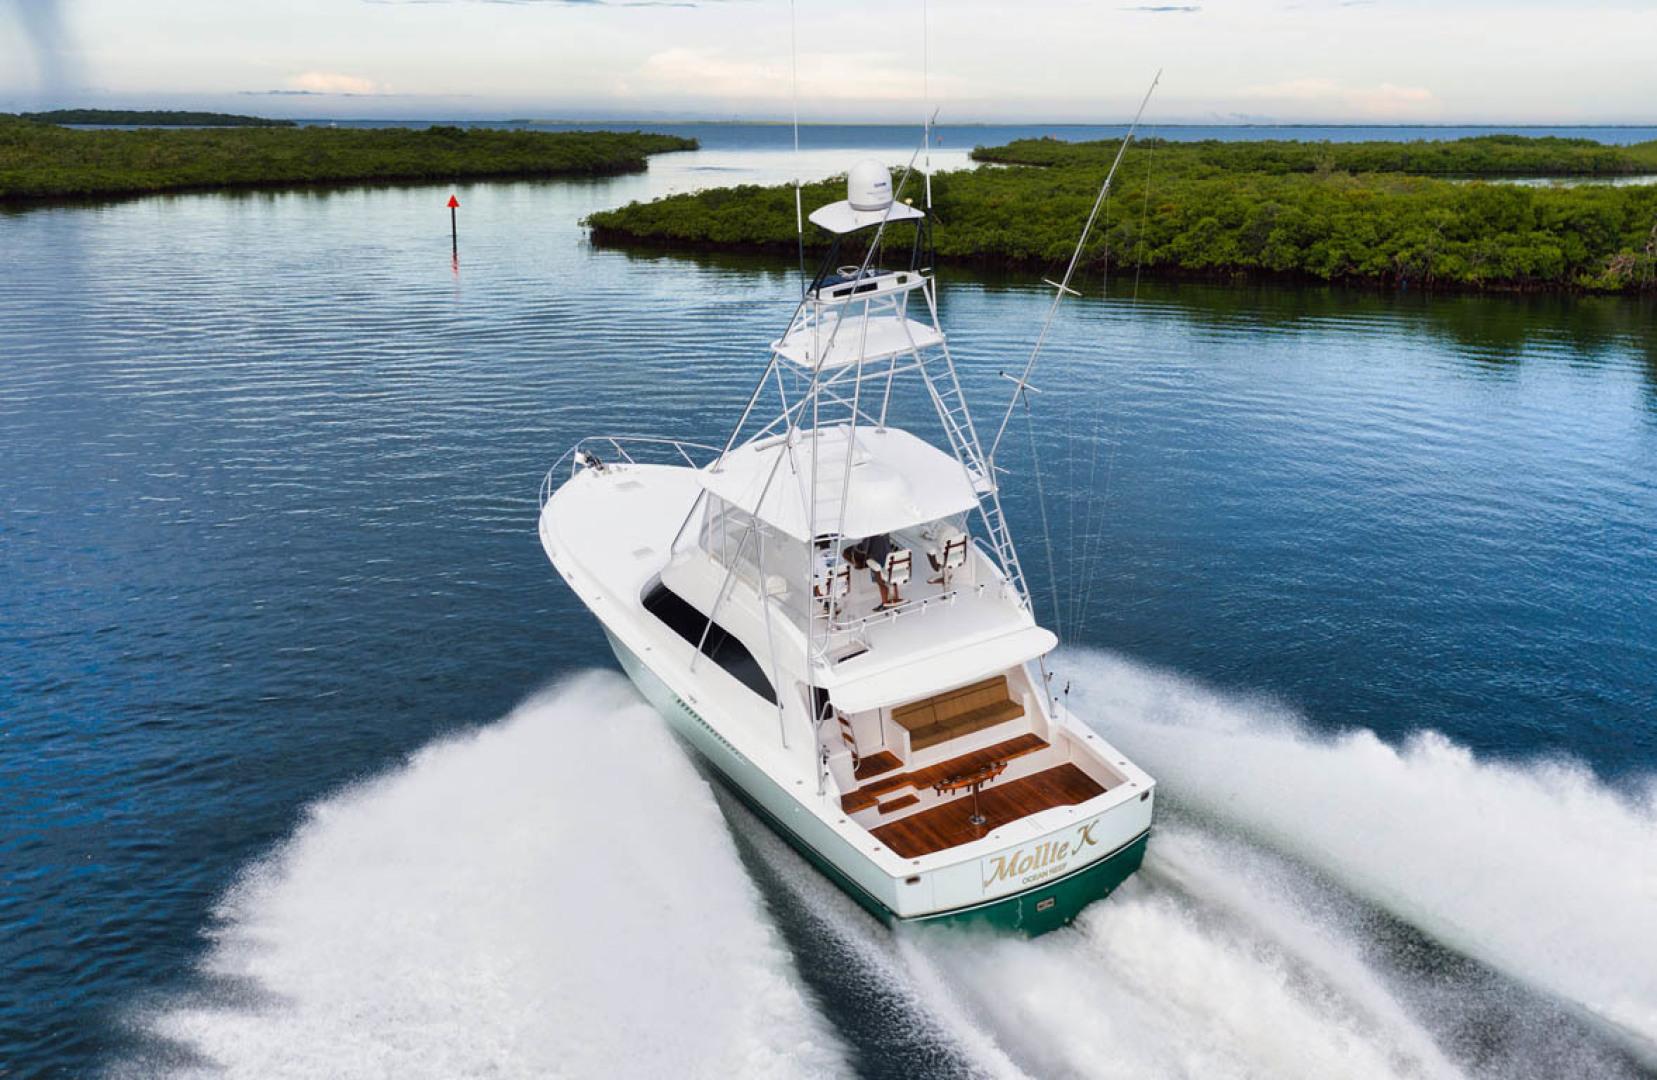 Viking-Convertible 2009-MOLLIE K Key Largo-Florida-United States-Aerial Aft View-1487443 | Thumbnail